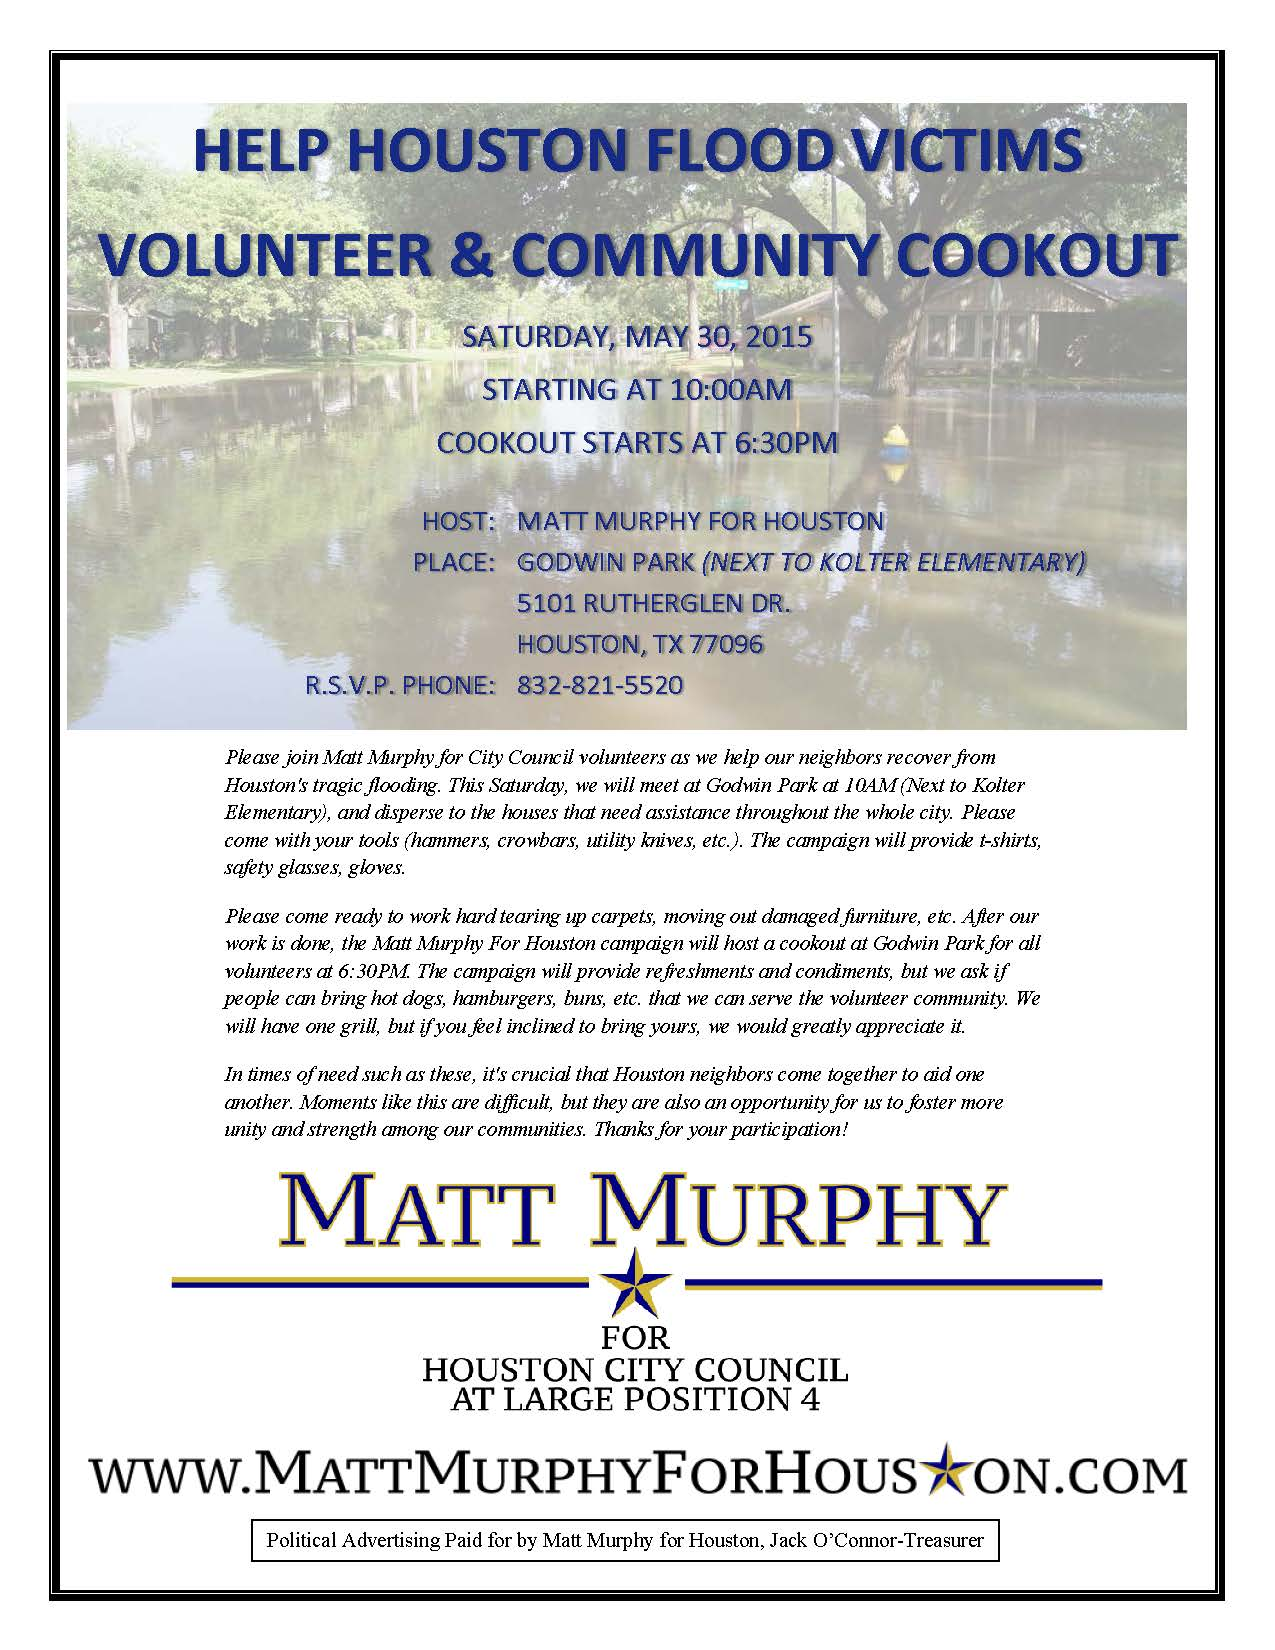 Help_Houston_Flood_Victims-Volunteer___Cookout.jpg